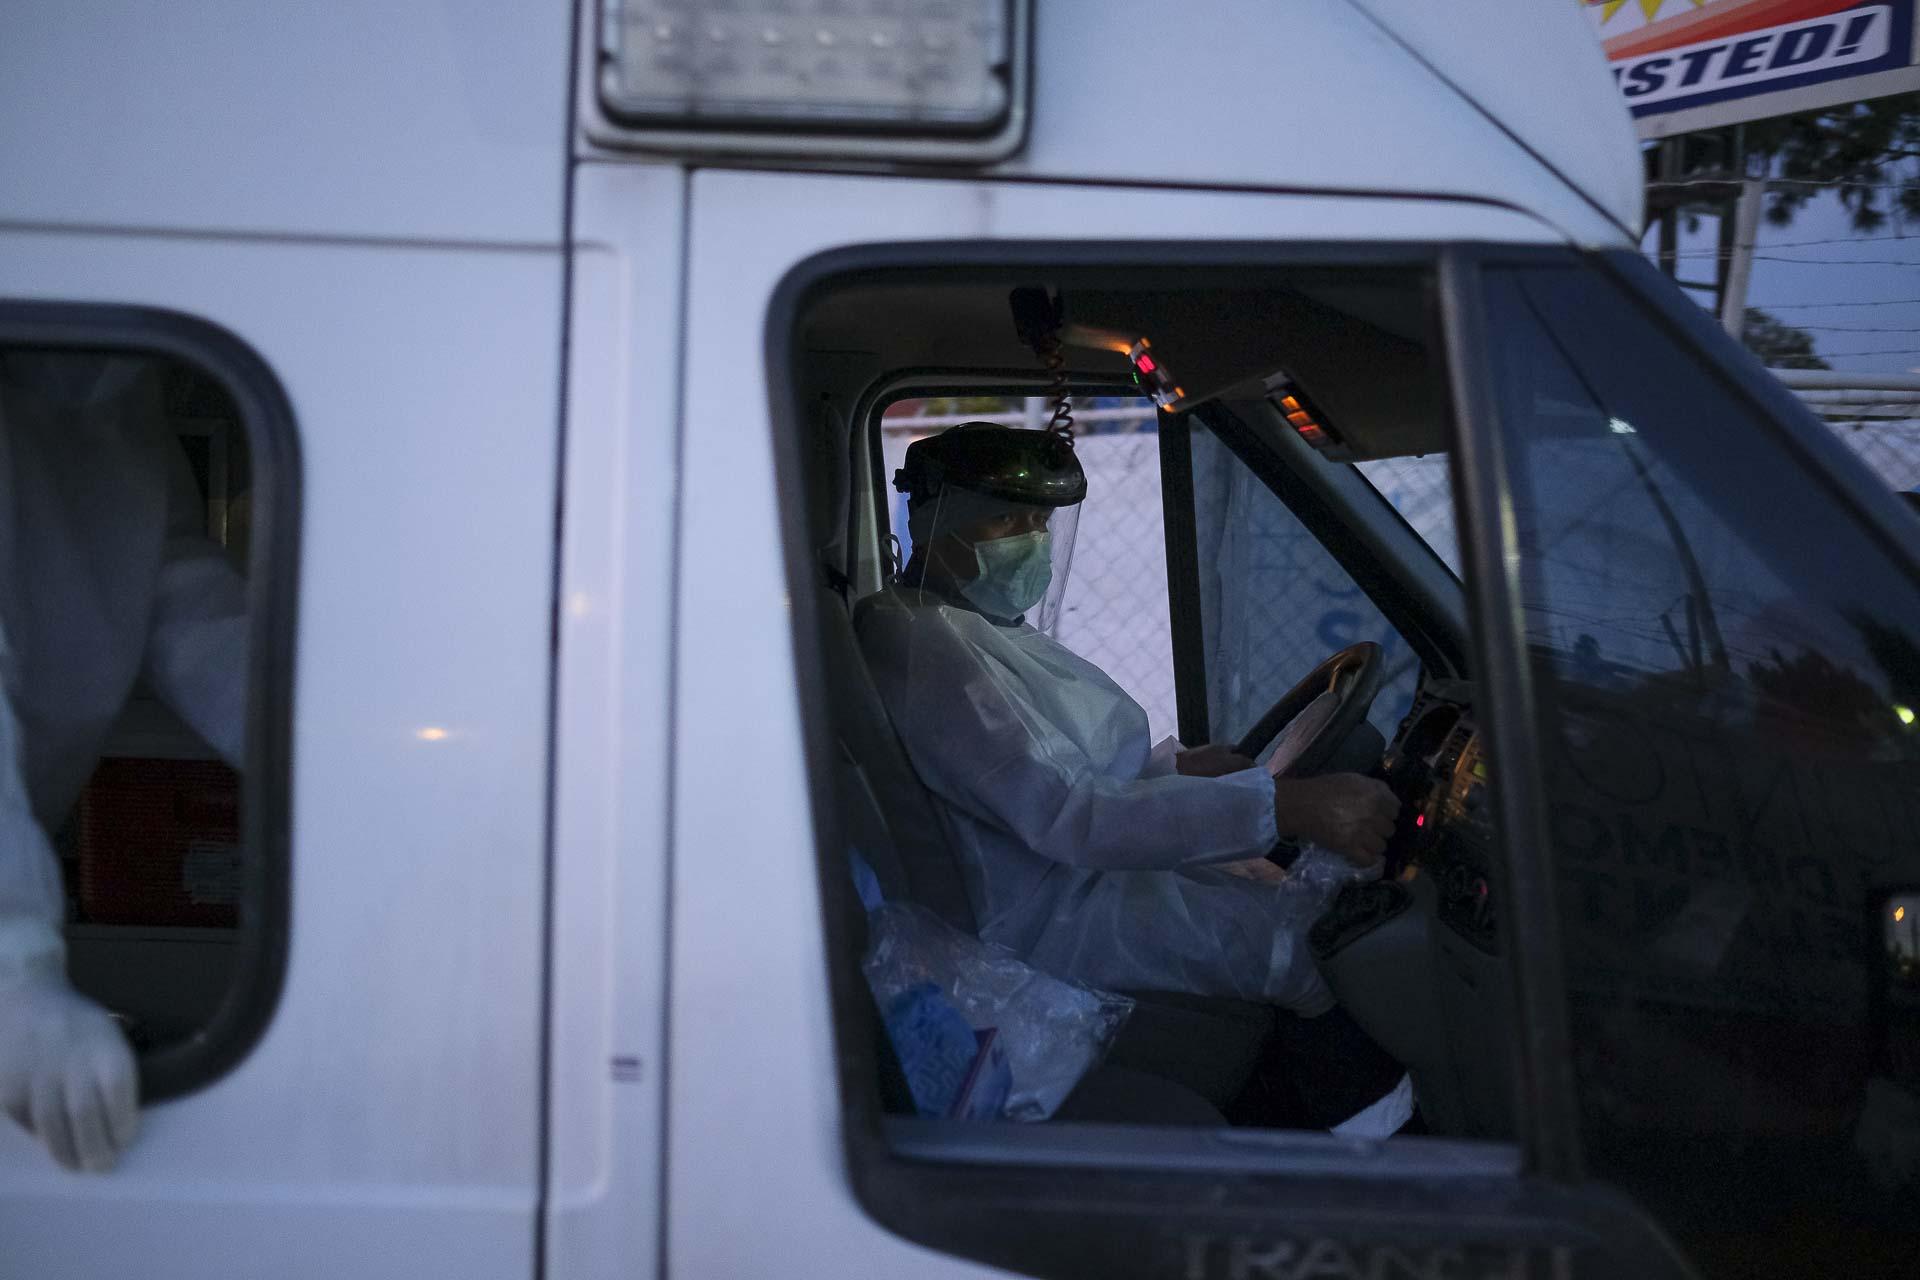 enfermero en camioneta